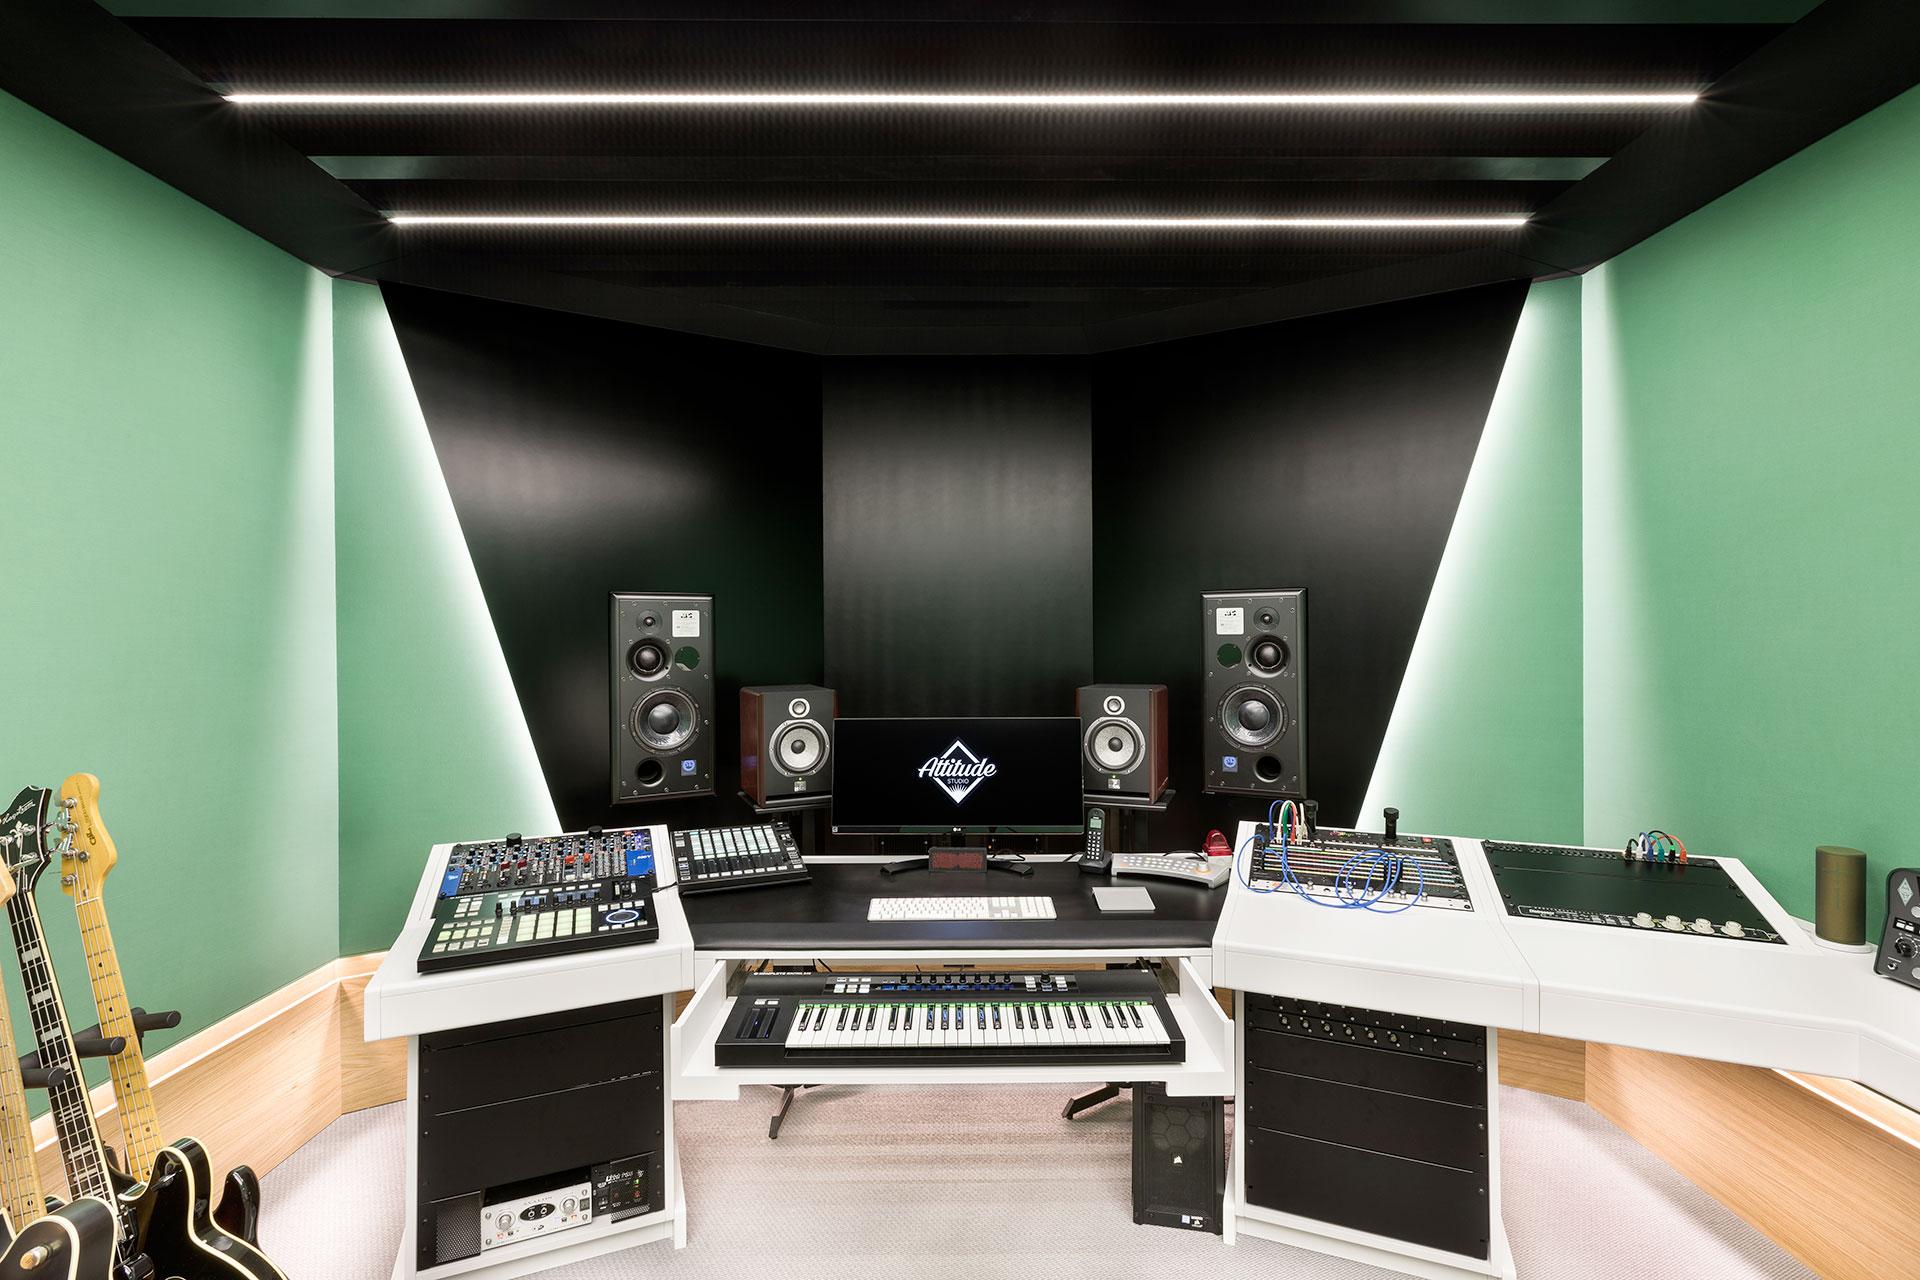 attitude-studio-03